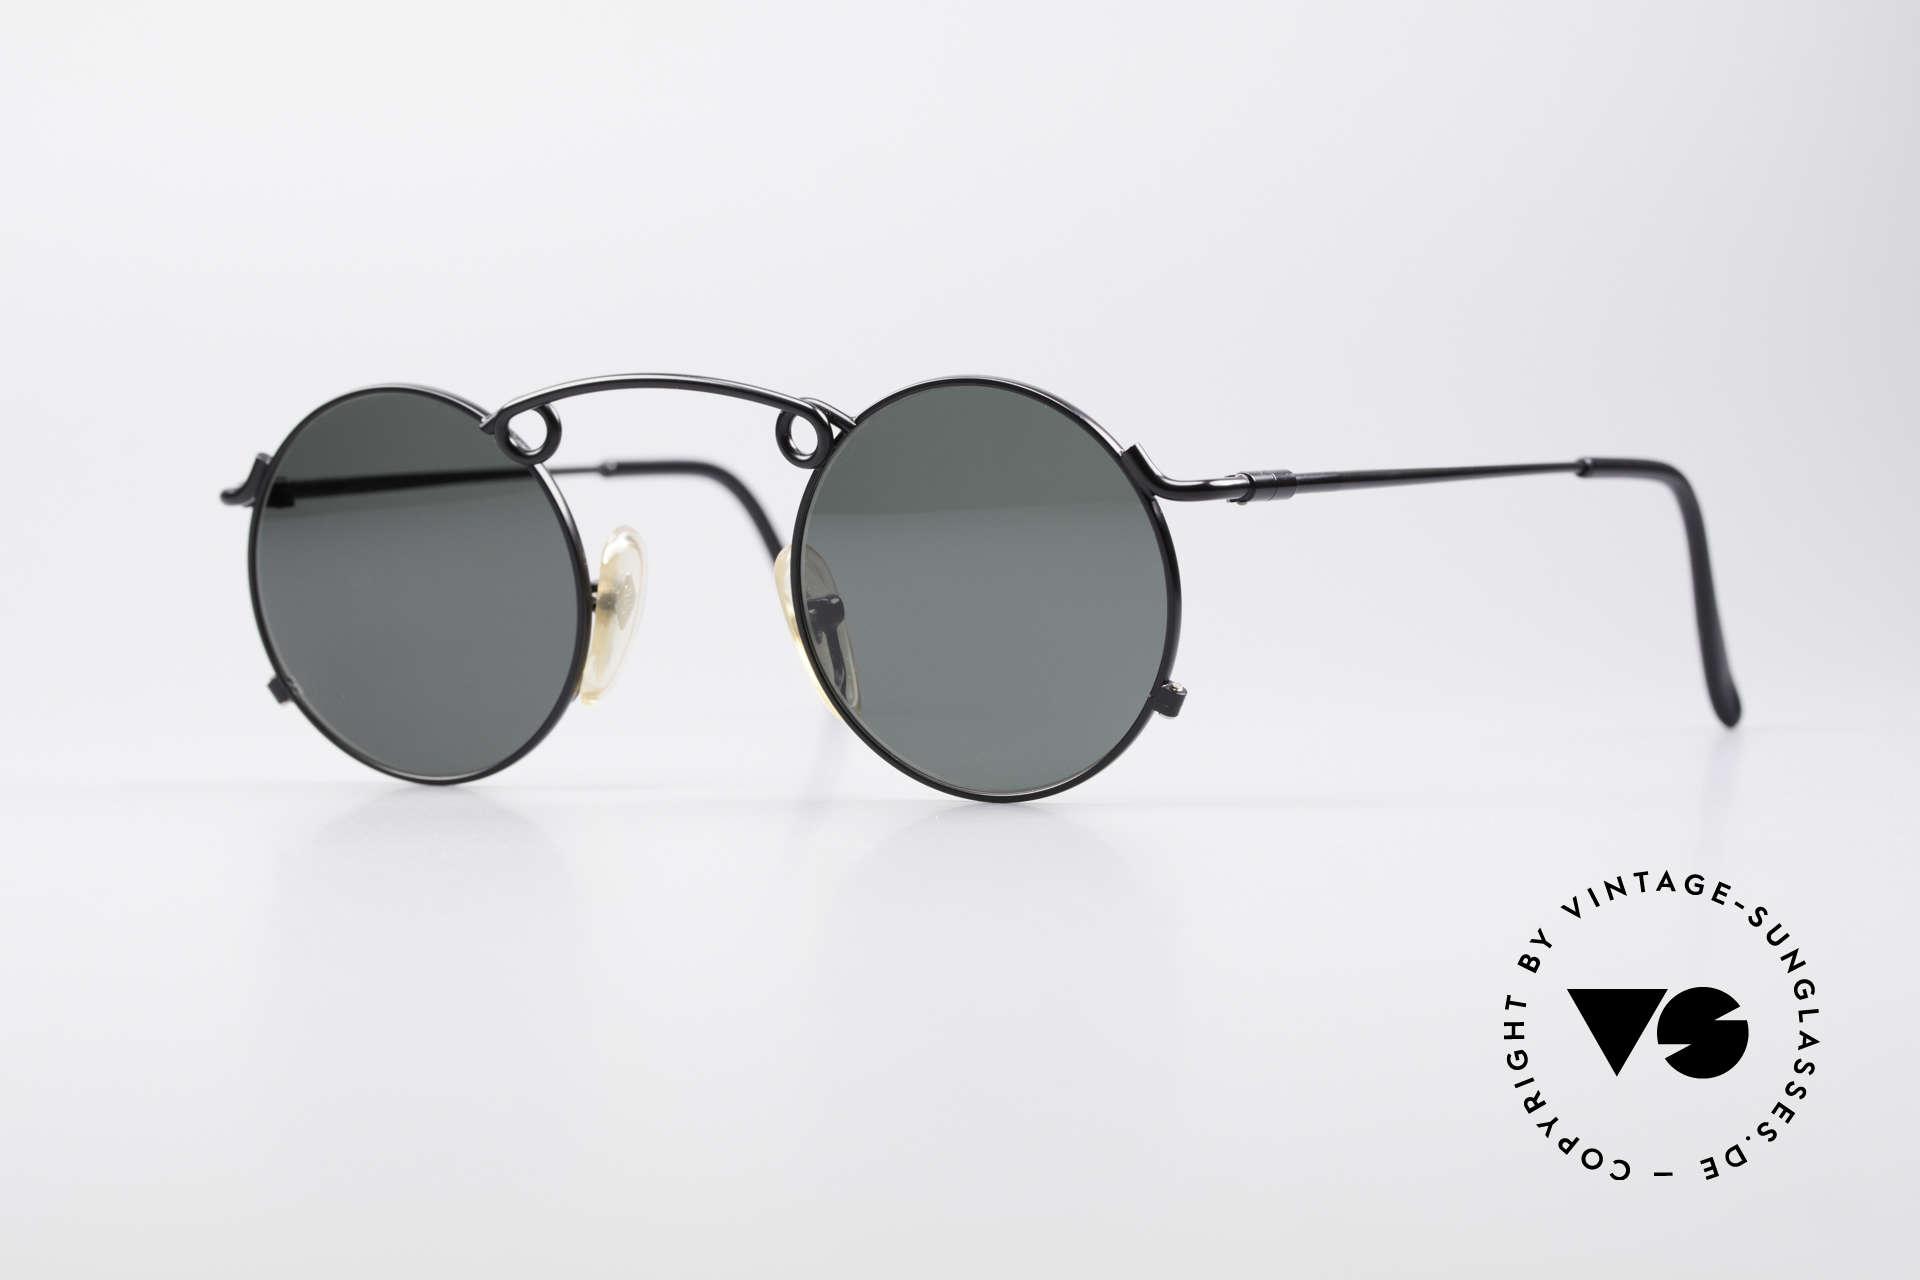 Jean Paul Gaultier 56-1178 Artful Panto Sunglasses, artful 'panto style' sunglasses by Jean Paul Gaultier, Made for Men and Women